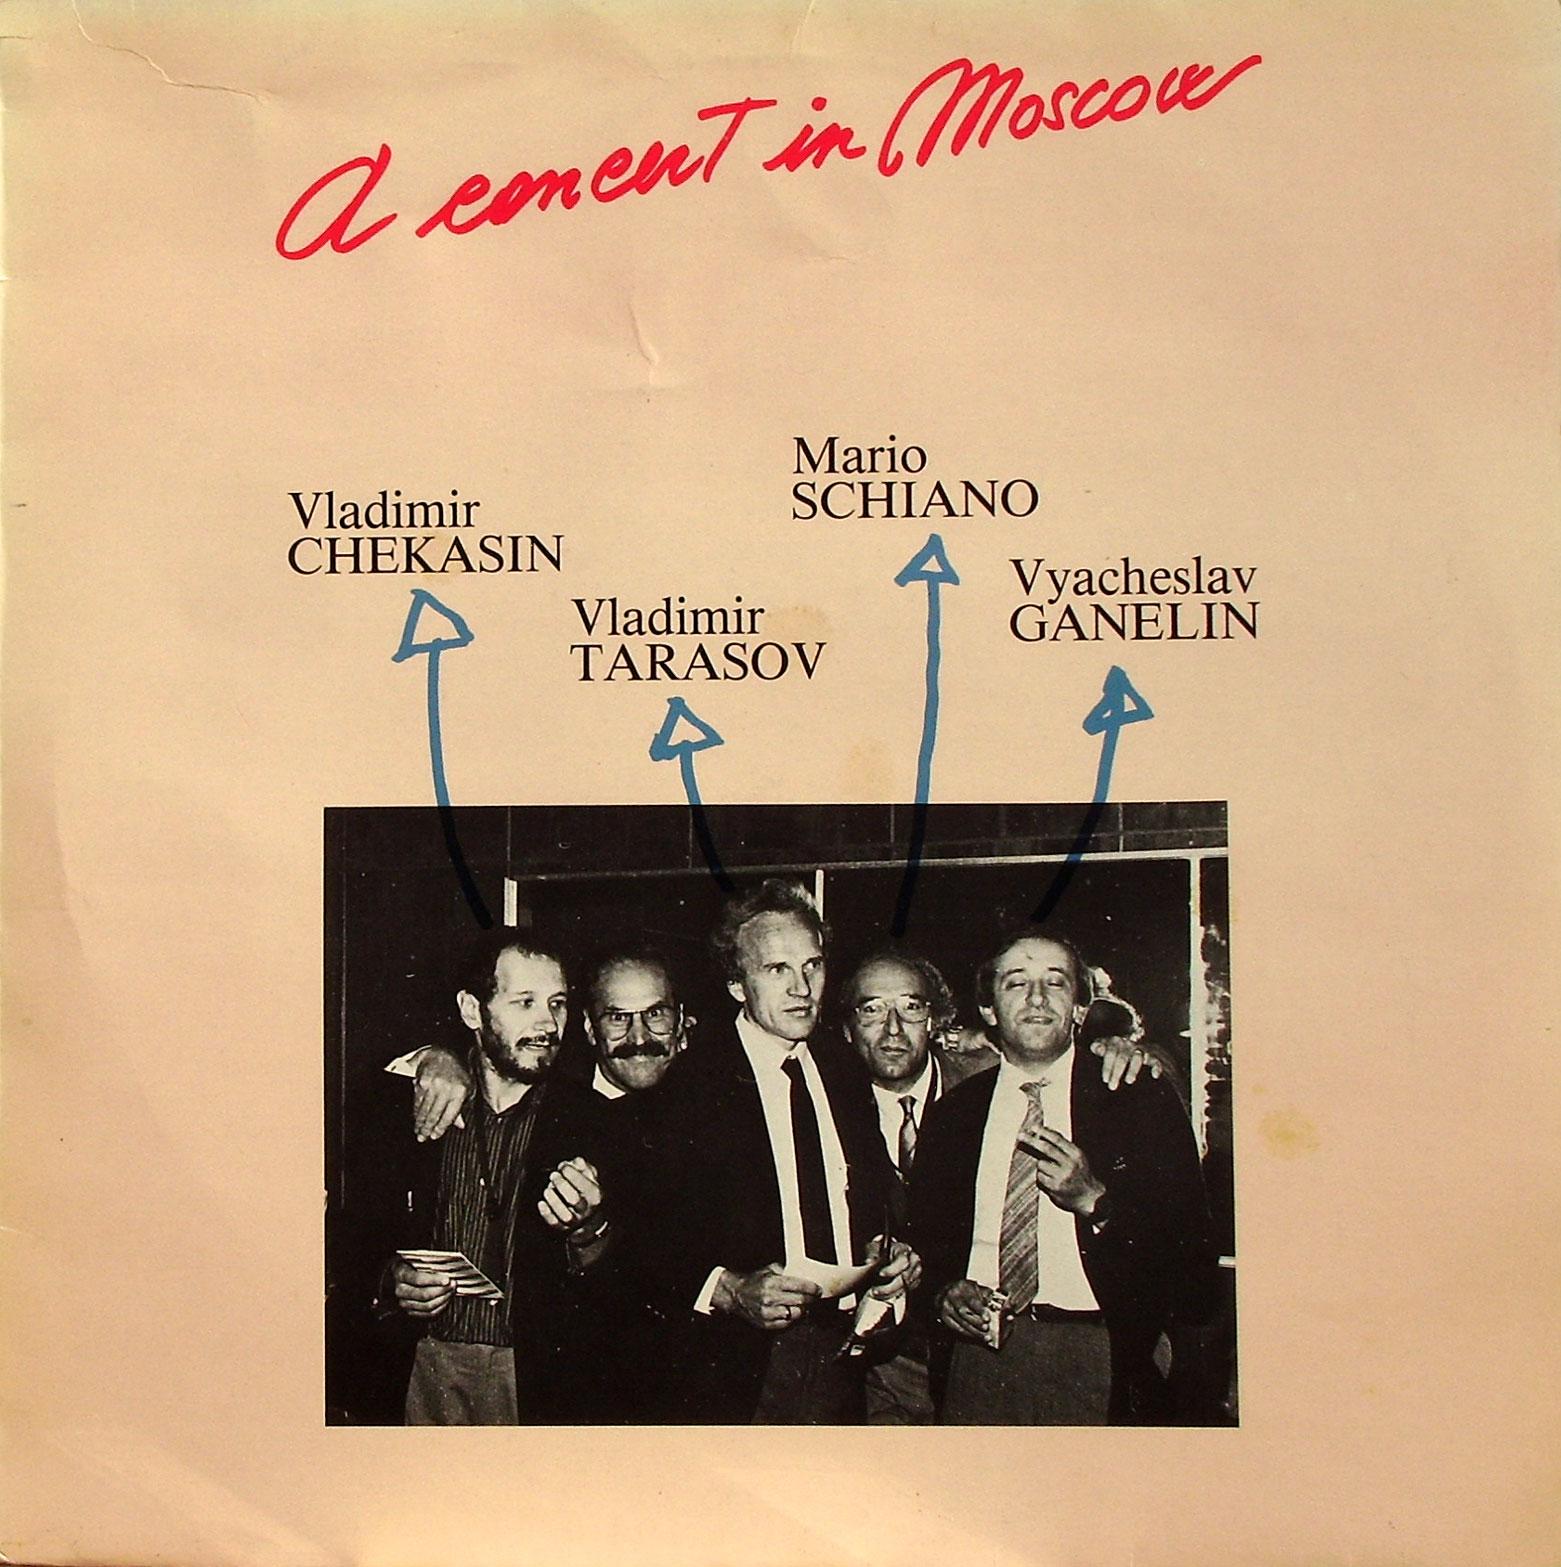 The Vladimir Chekasin Quartet Nostalgia